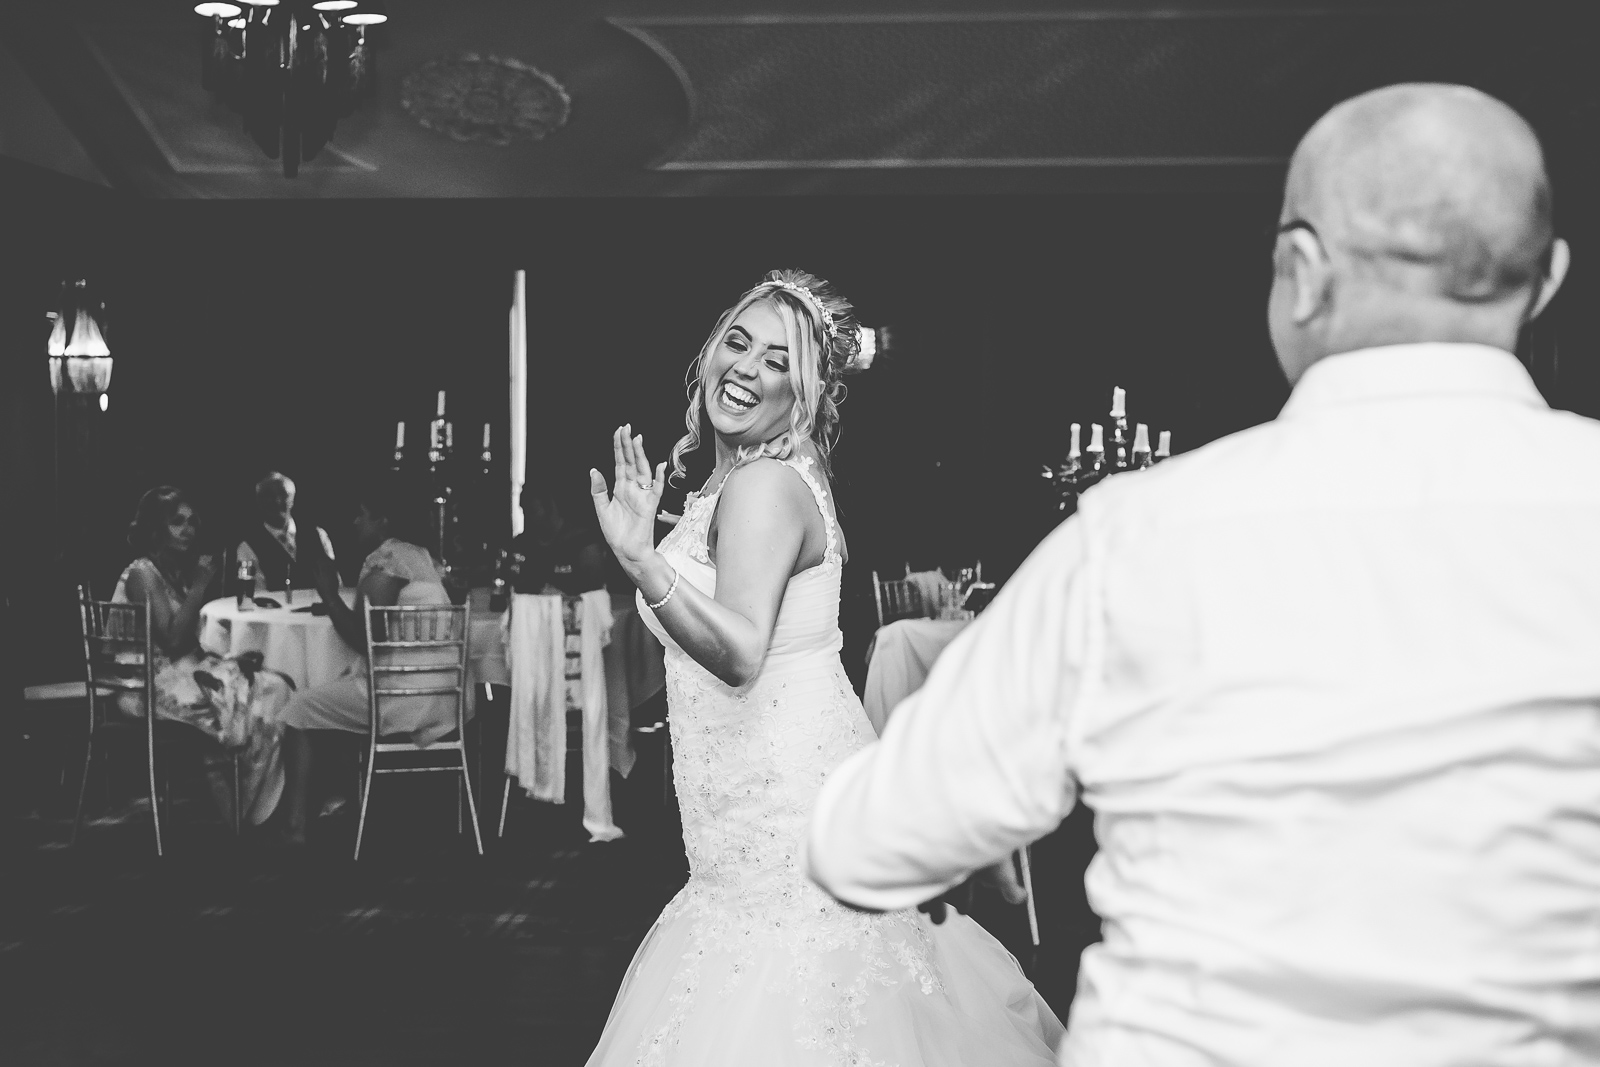 cornhill_castle_wedding_biggar_dearlyphotography (395 of 448).jpg